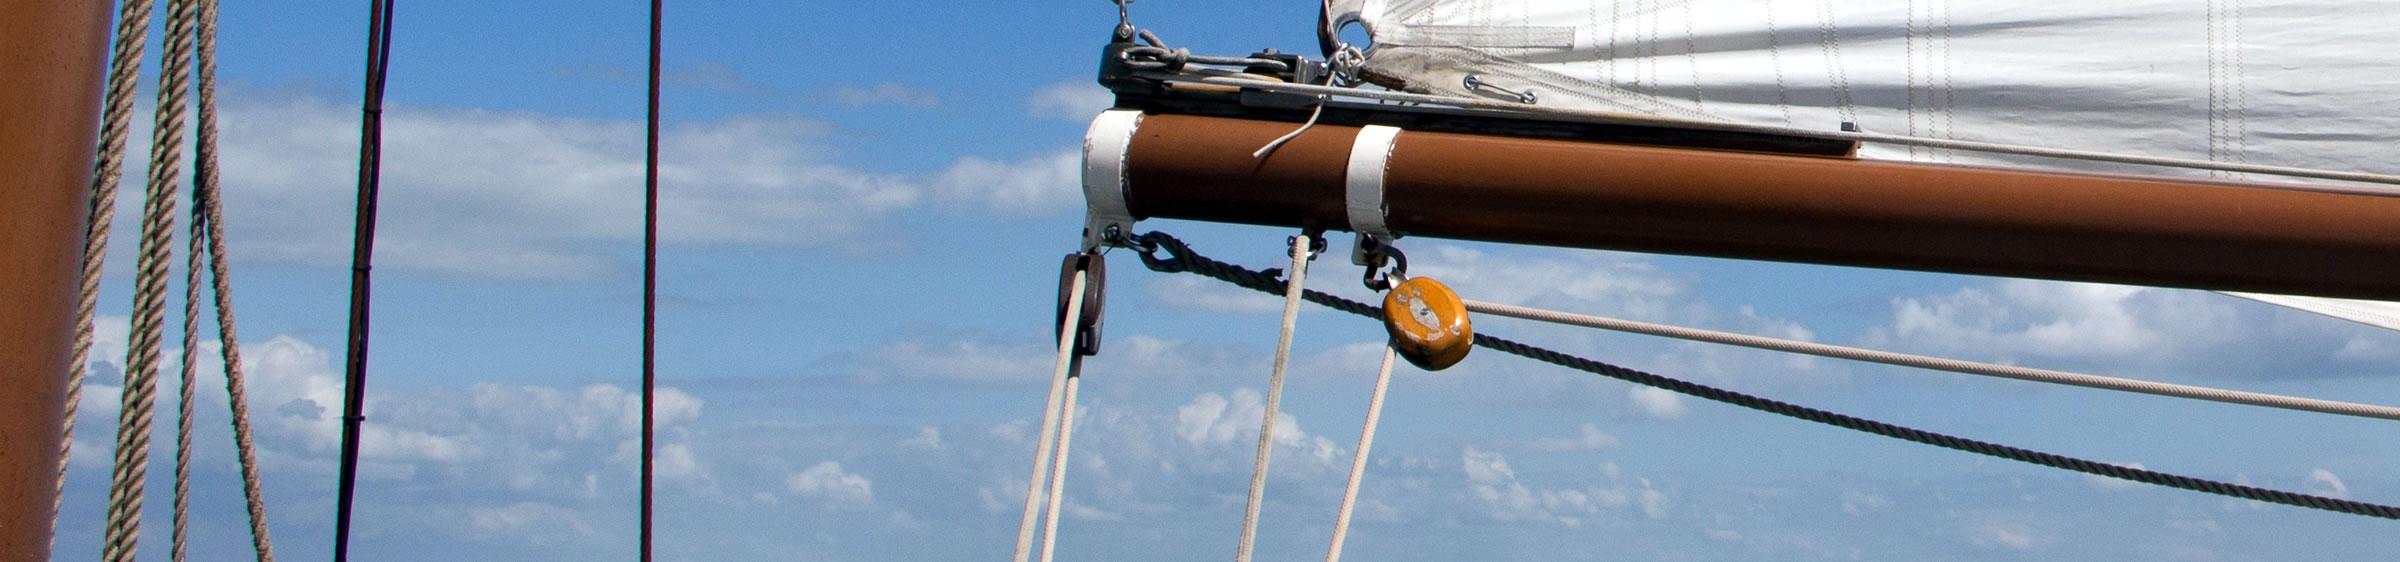 Afternoon sailing trip Monnickendam